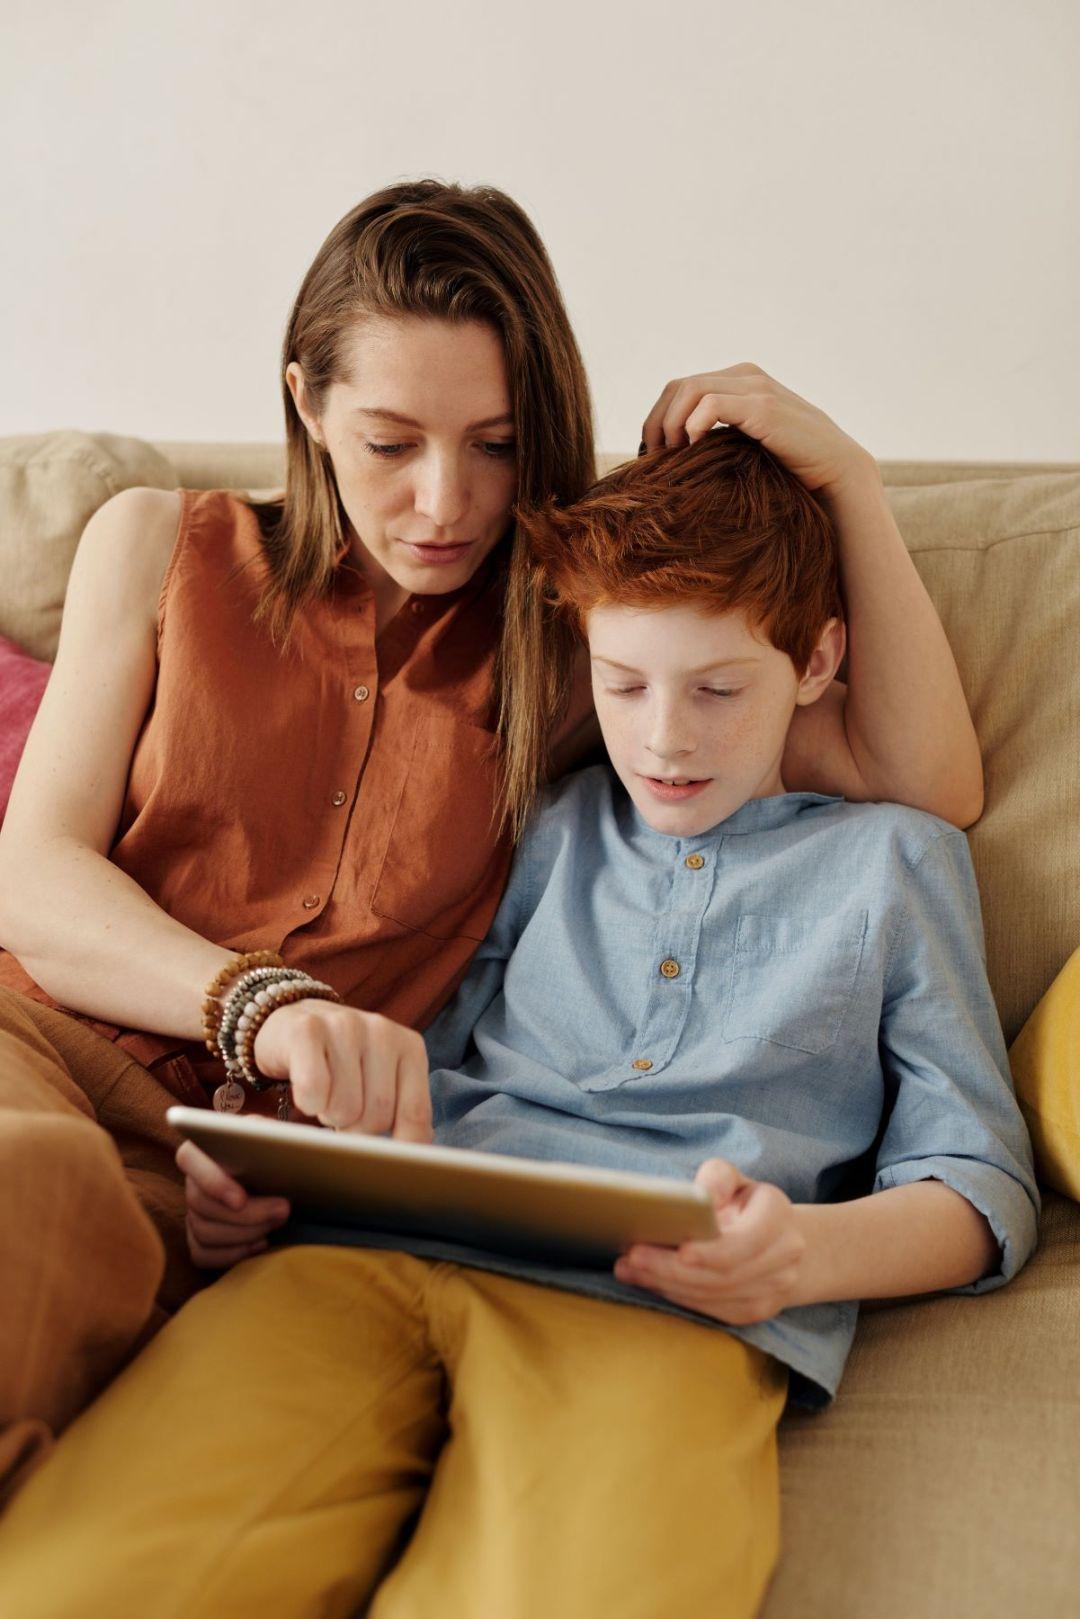 Mother helping son adjust to online school